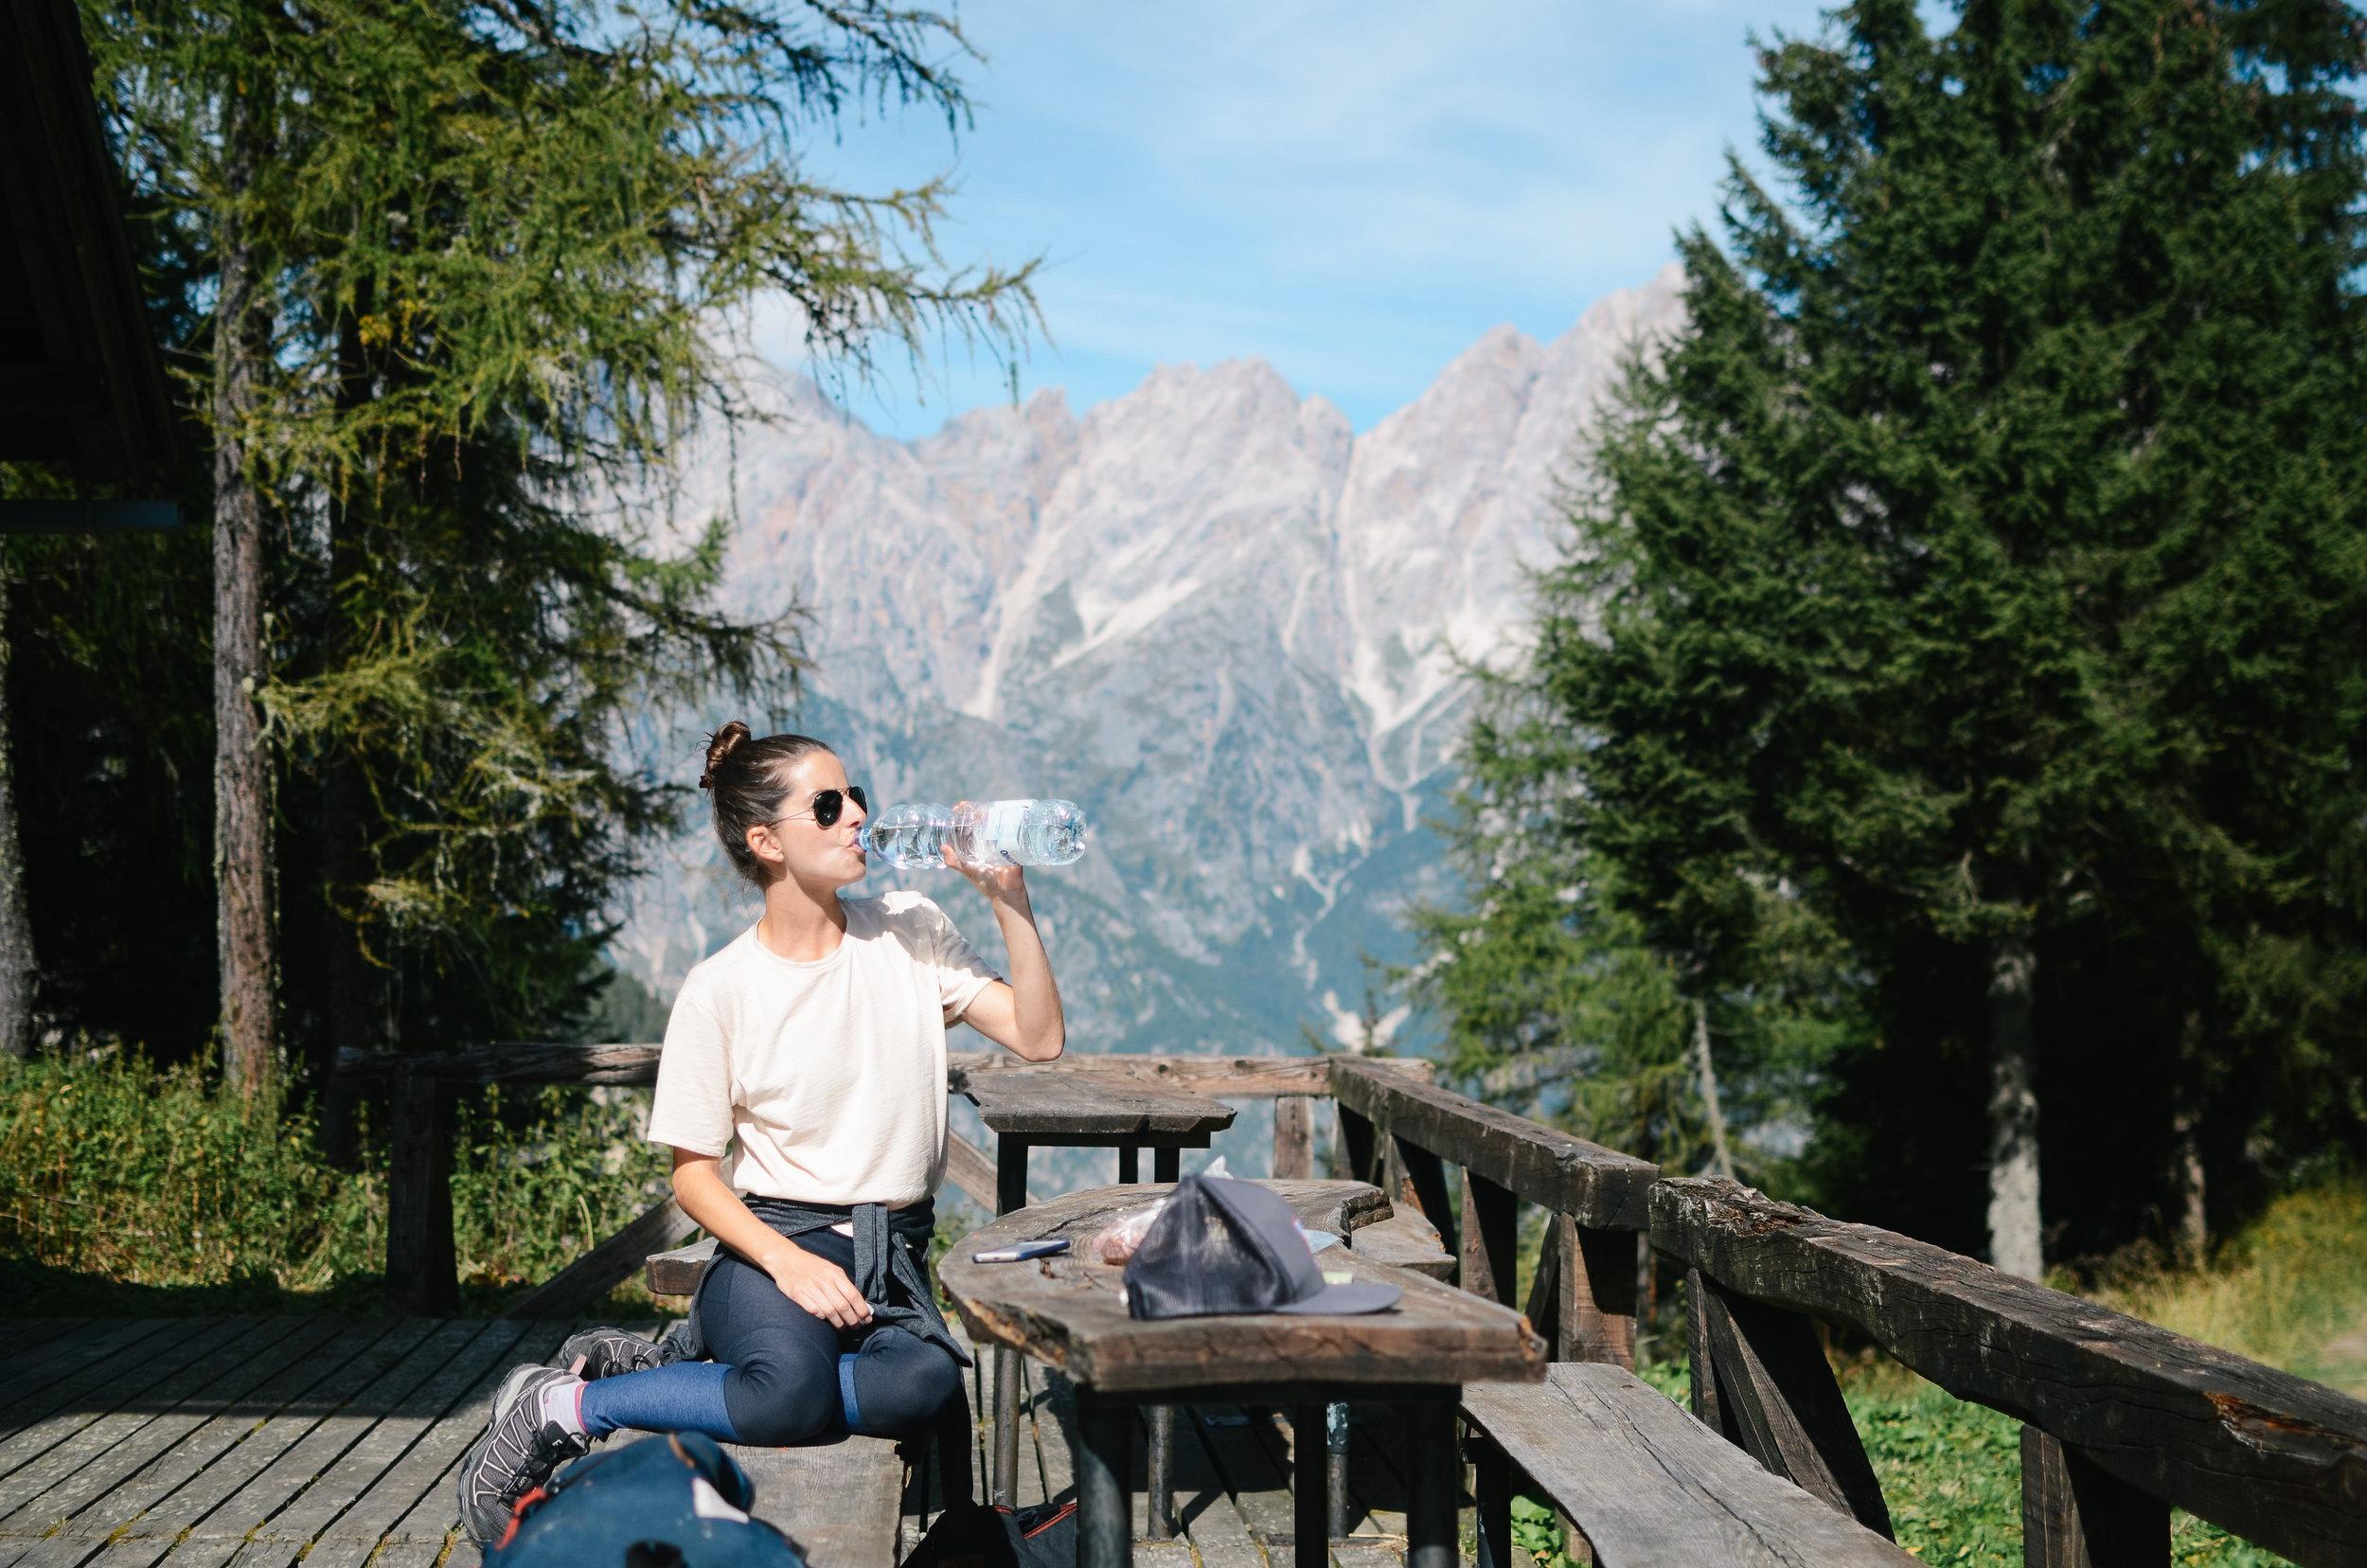 adventure-in-italy-3-hikes-dolomites-hiking-travel-blog-tyrol-3.jpg